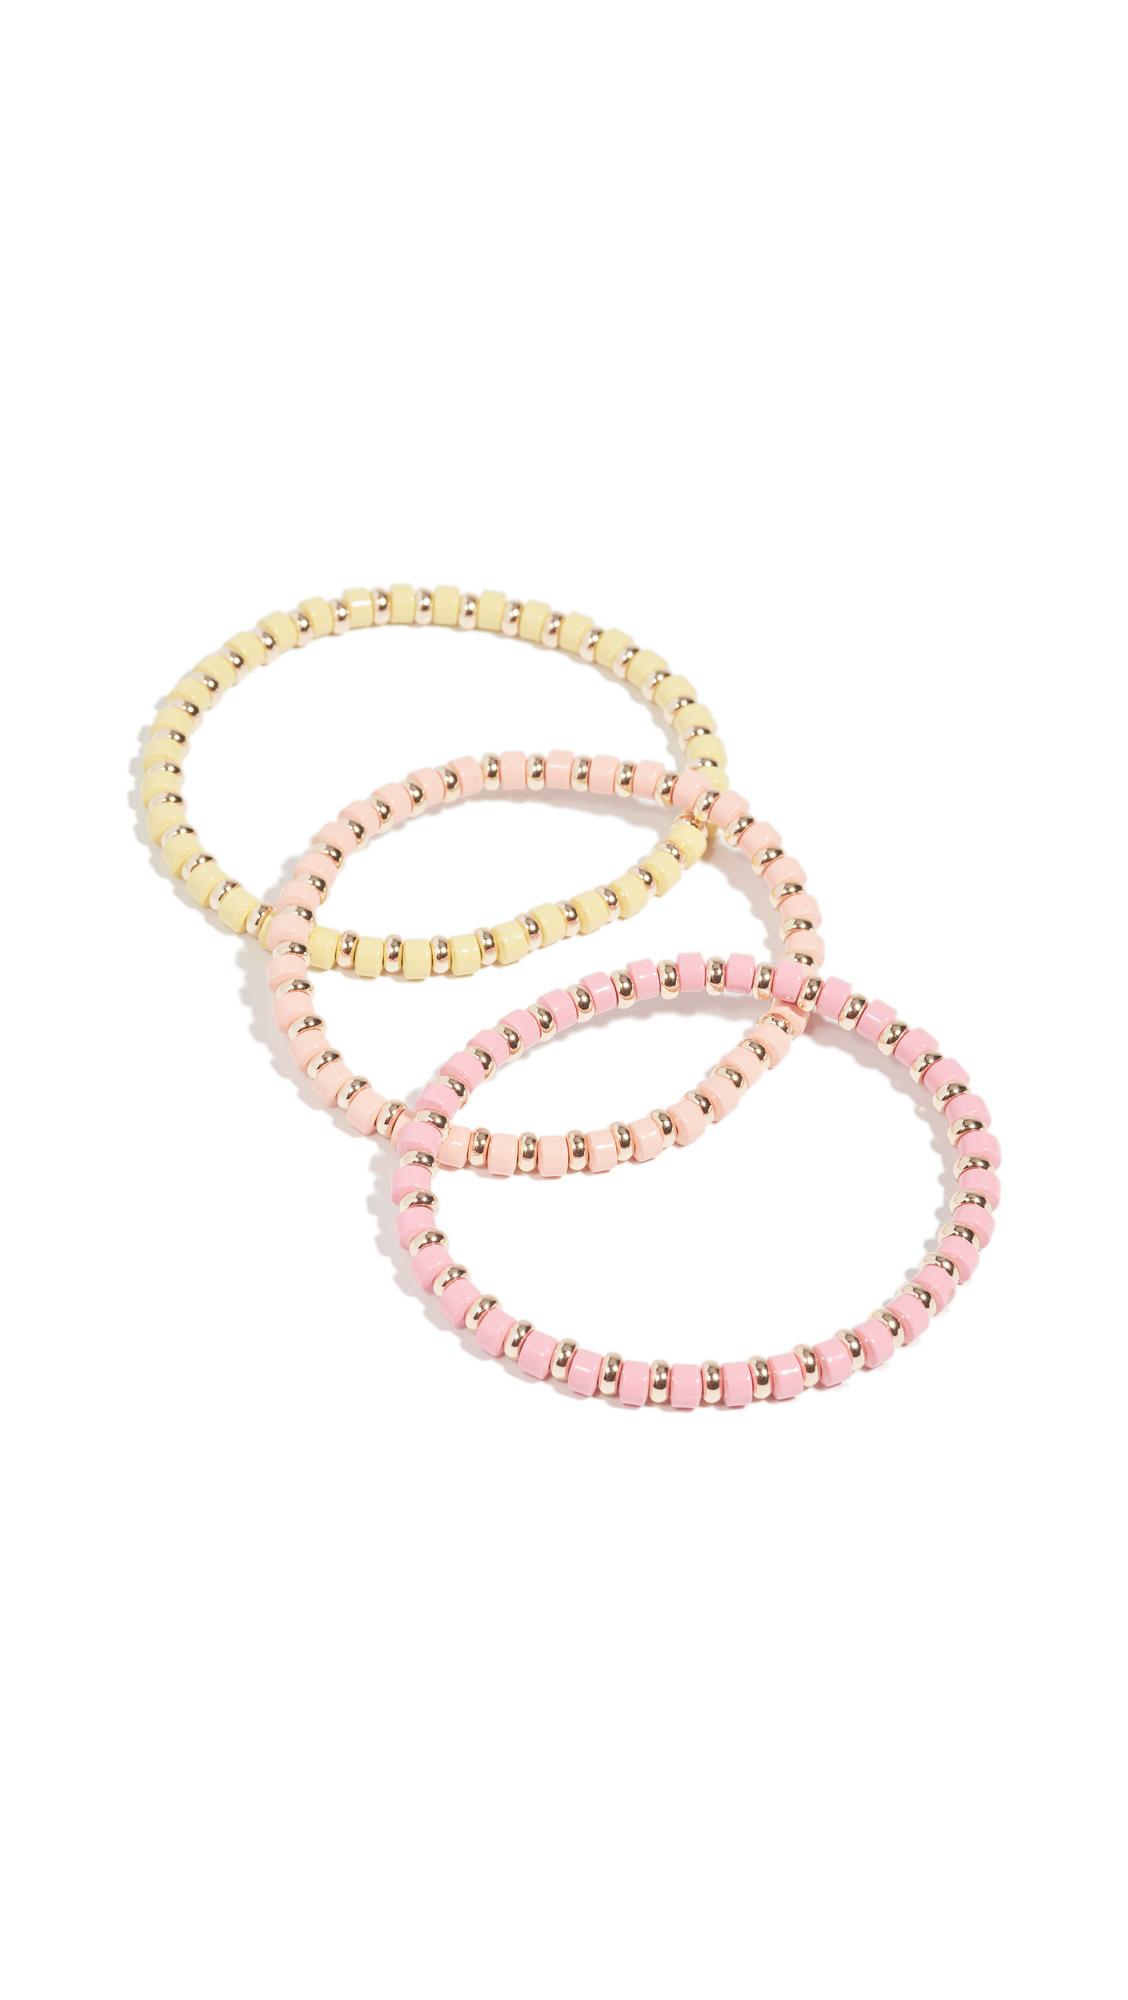 Roxanne Assoulin Pink Little Ones Bracelets